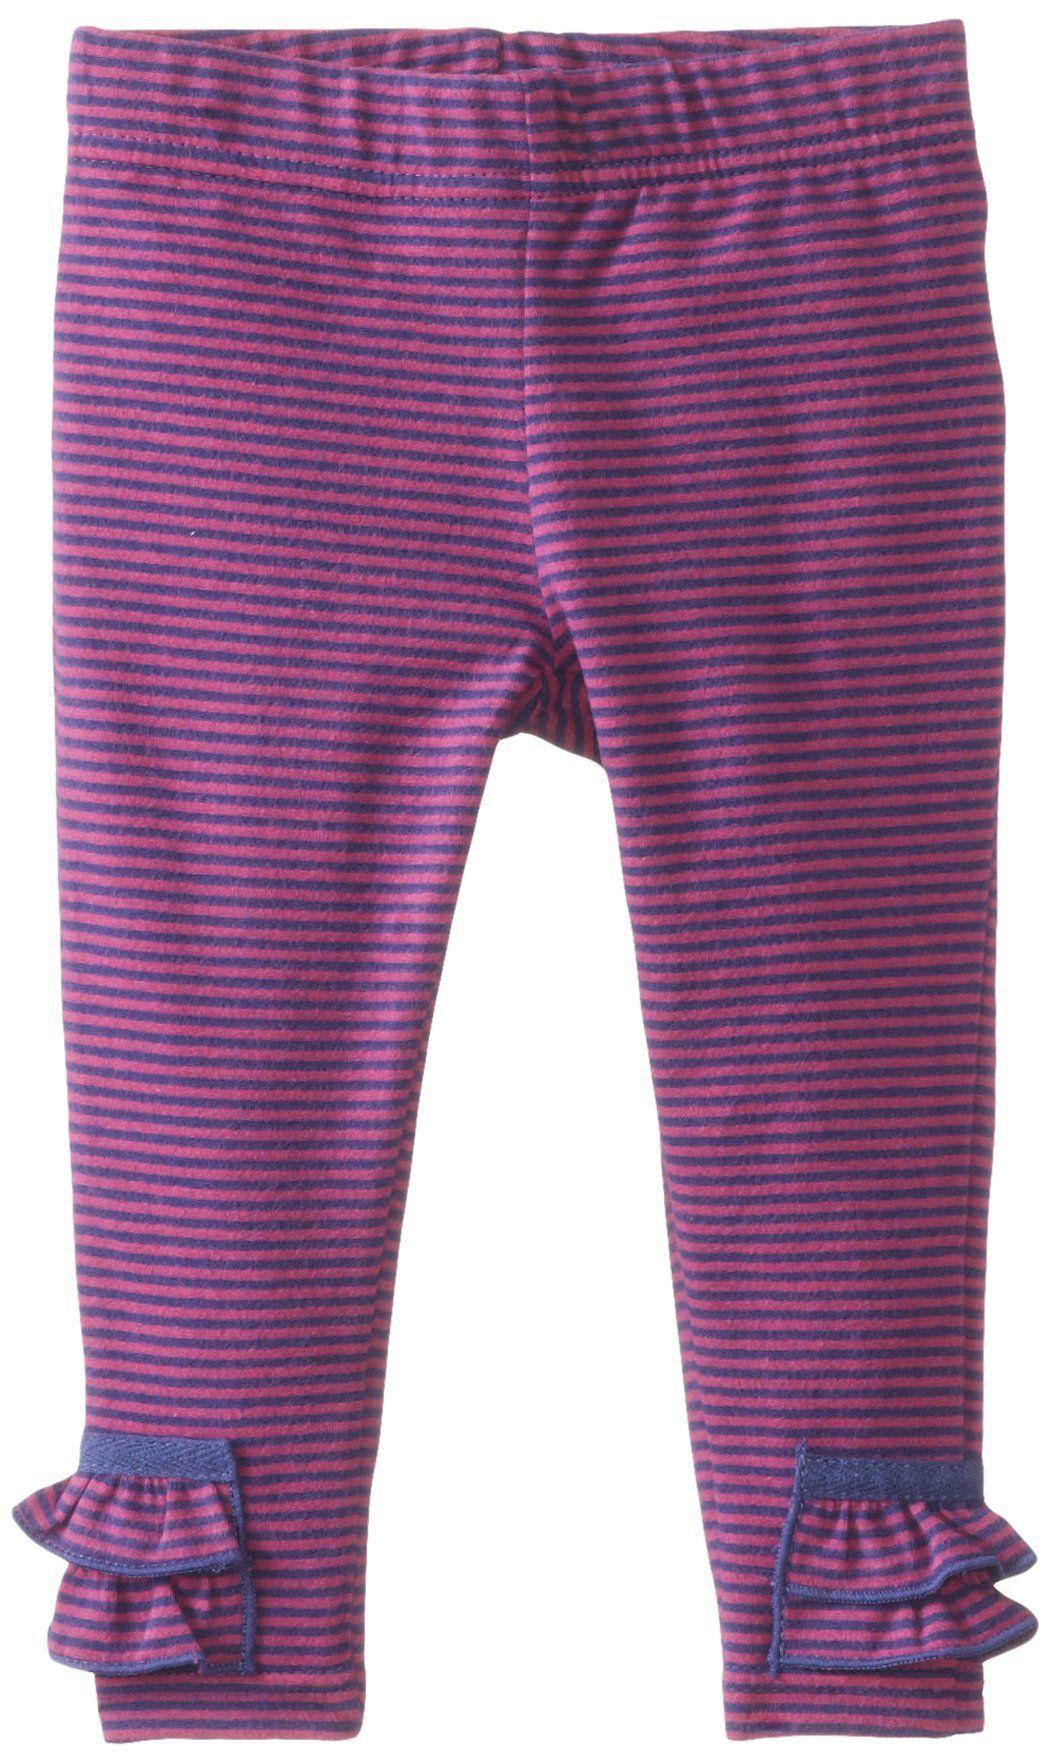 Amazon Com Pumpkin Patch Little Girls Stripe Legging Clothing Kids Outfits Girls Sportswear Kids Fashion Girl